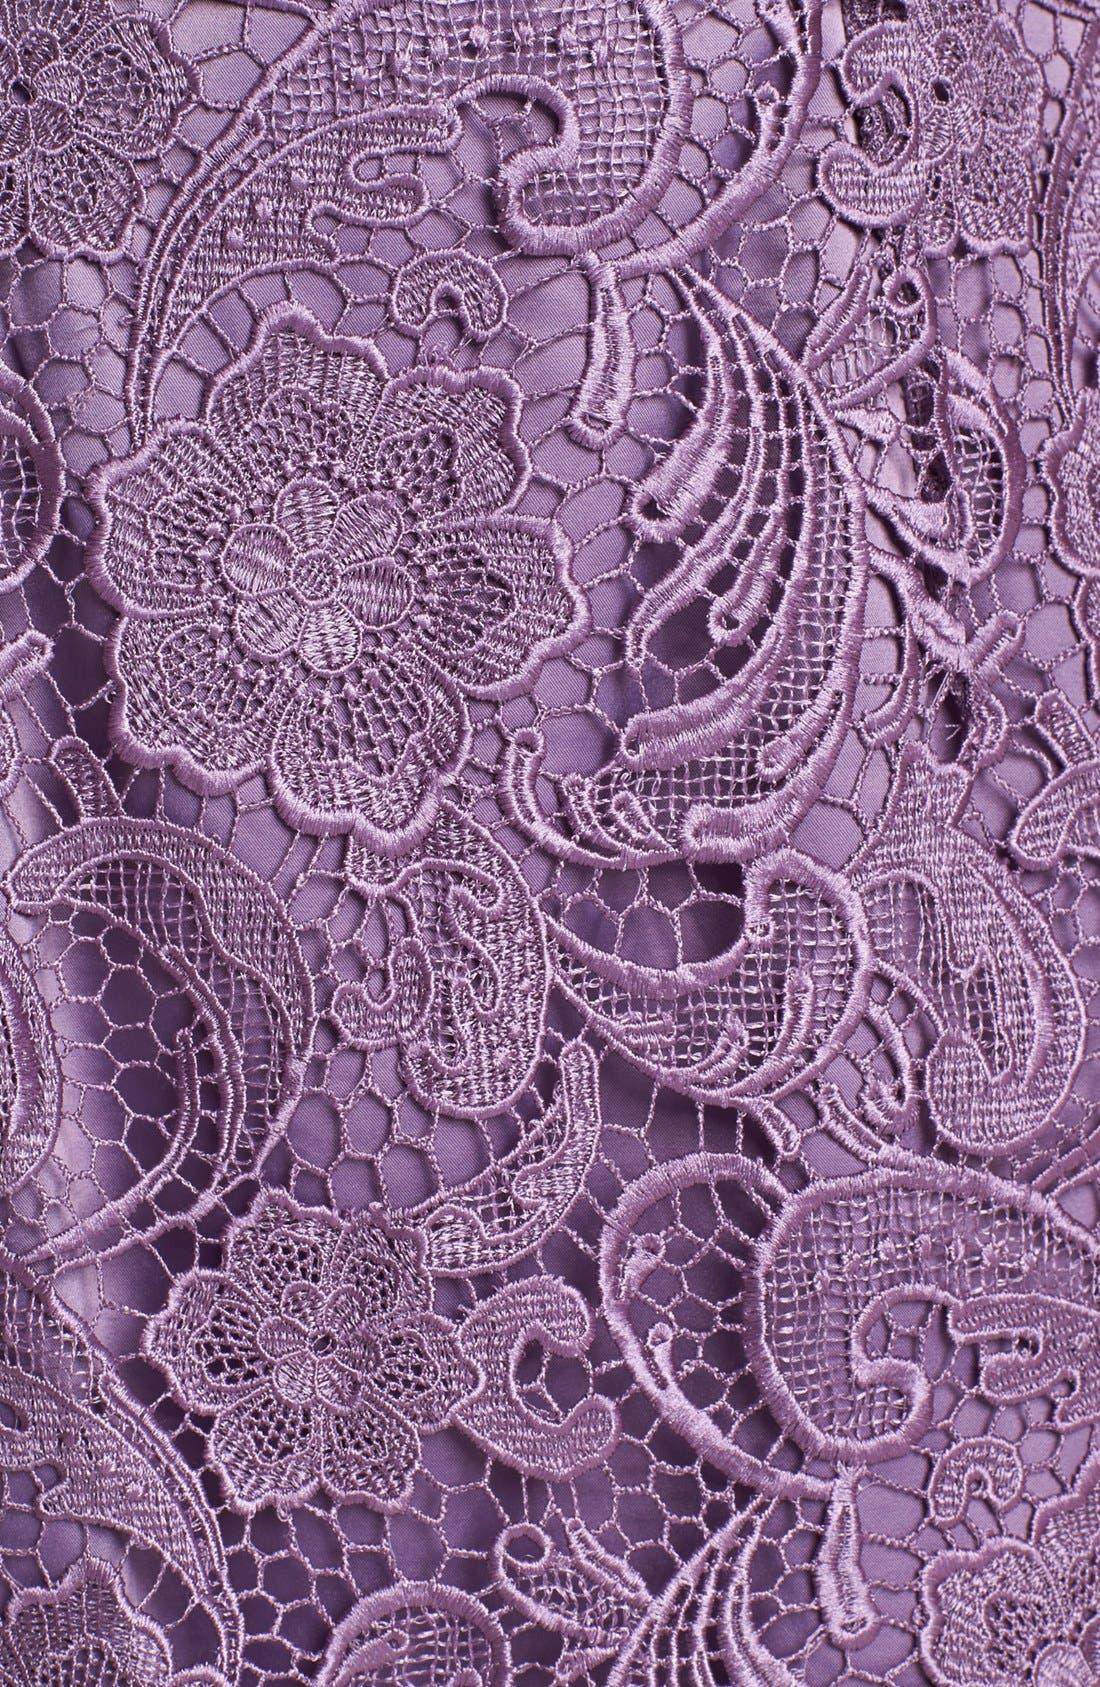 Illusion Bodice Lace Sheath Dress,                             Alternate thumbnail 29, color,